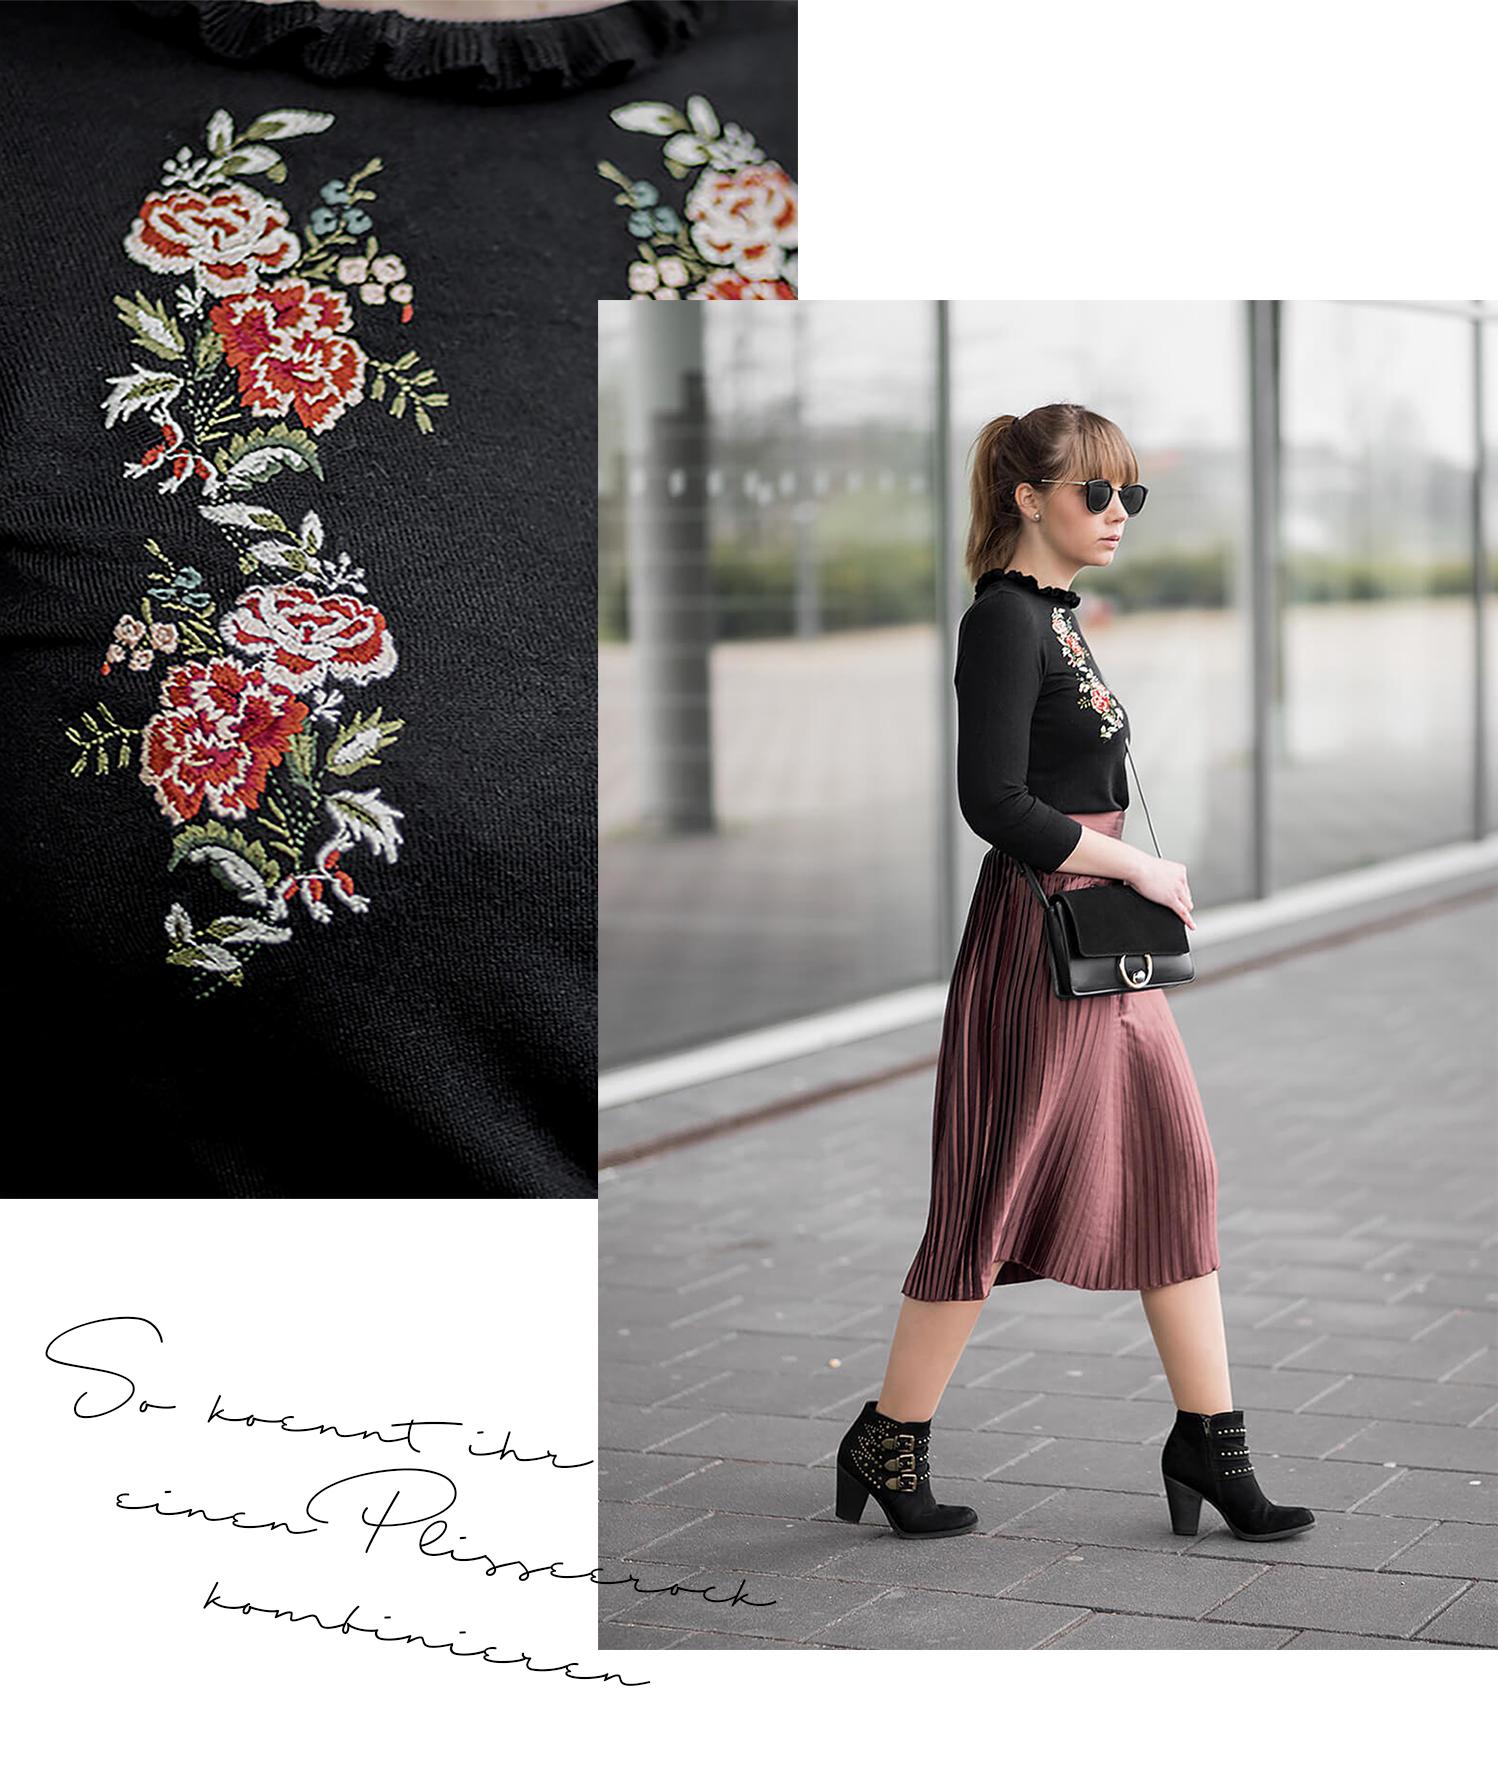 Spring Lookbook 2017, Outfits für den Frühling, bezauberndenana.de